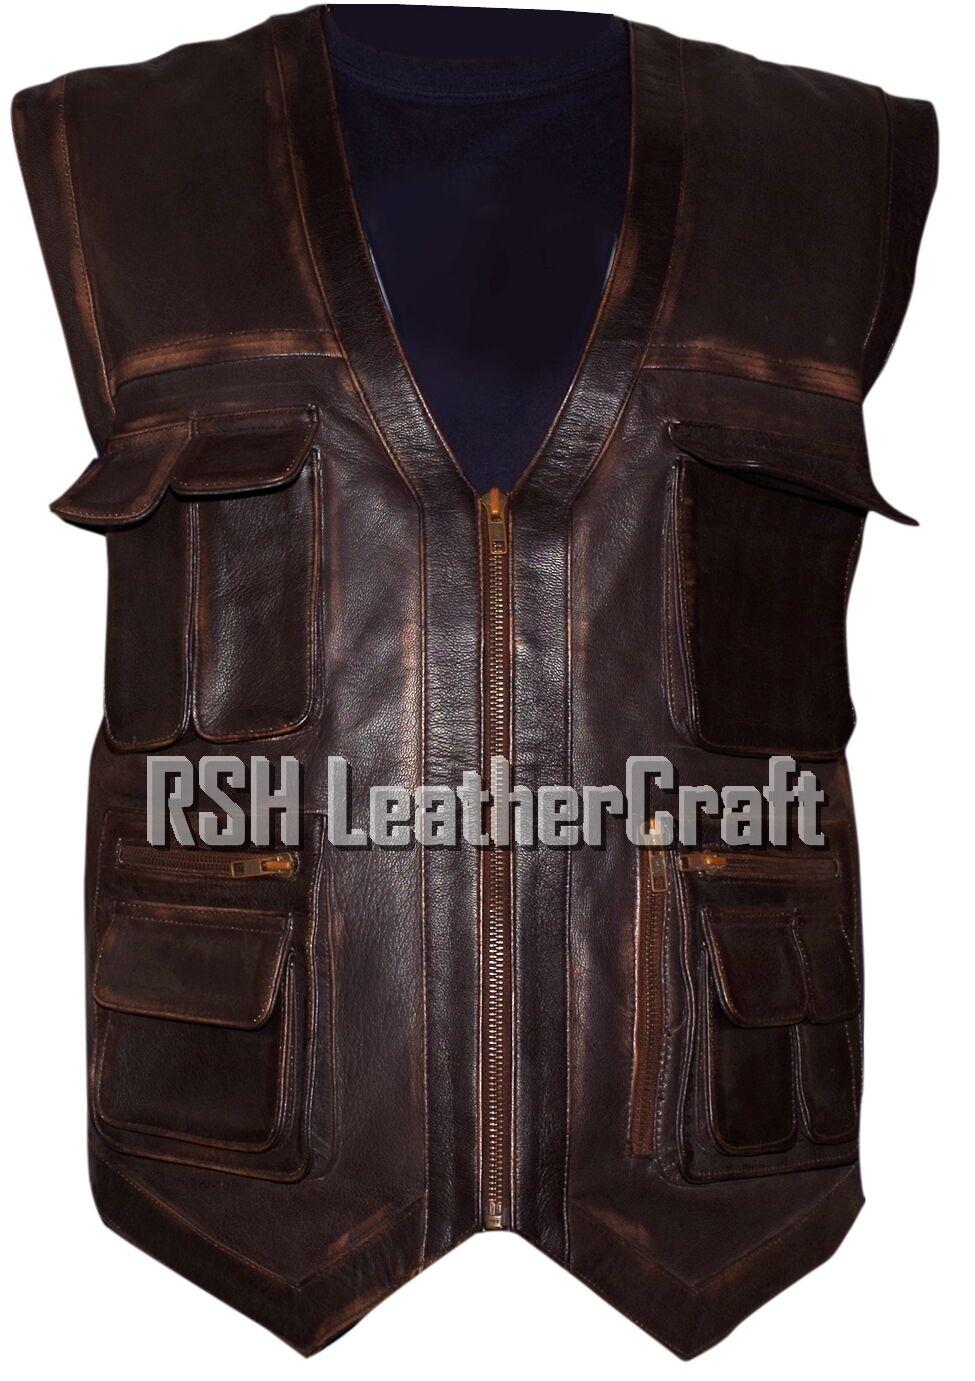 Jurassic World Chris Pratt Owen Grady Braun Distressed Real Leder Vest